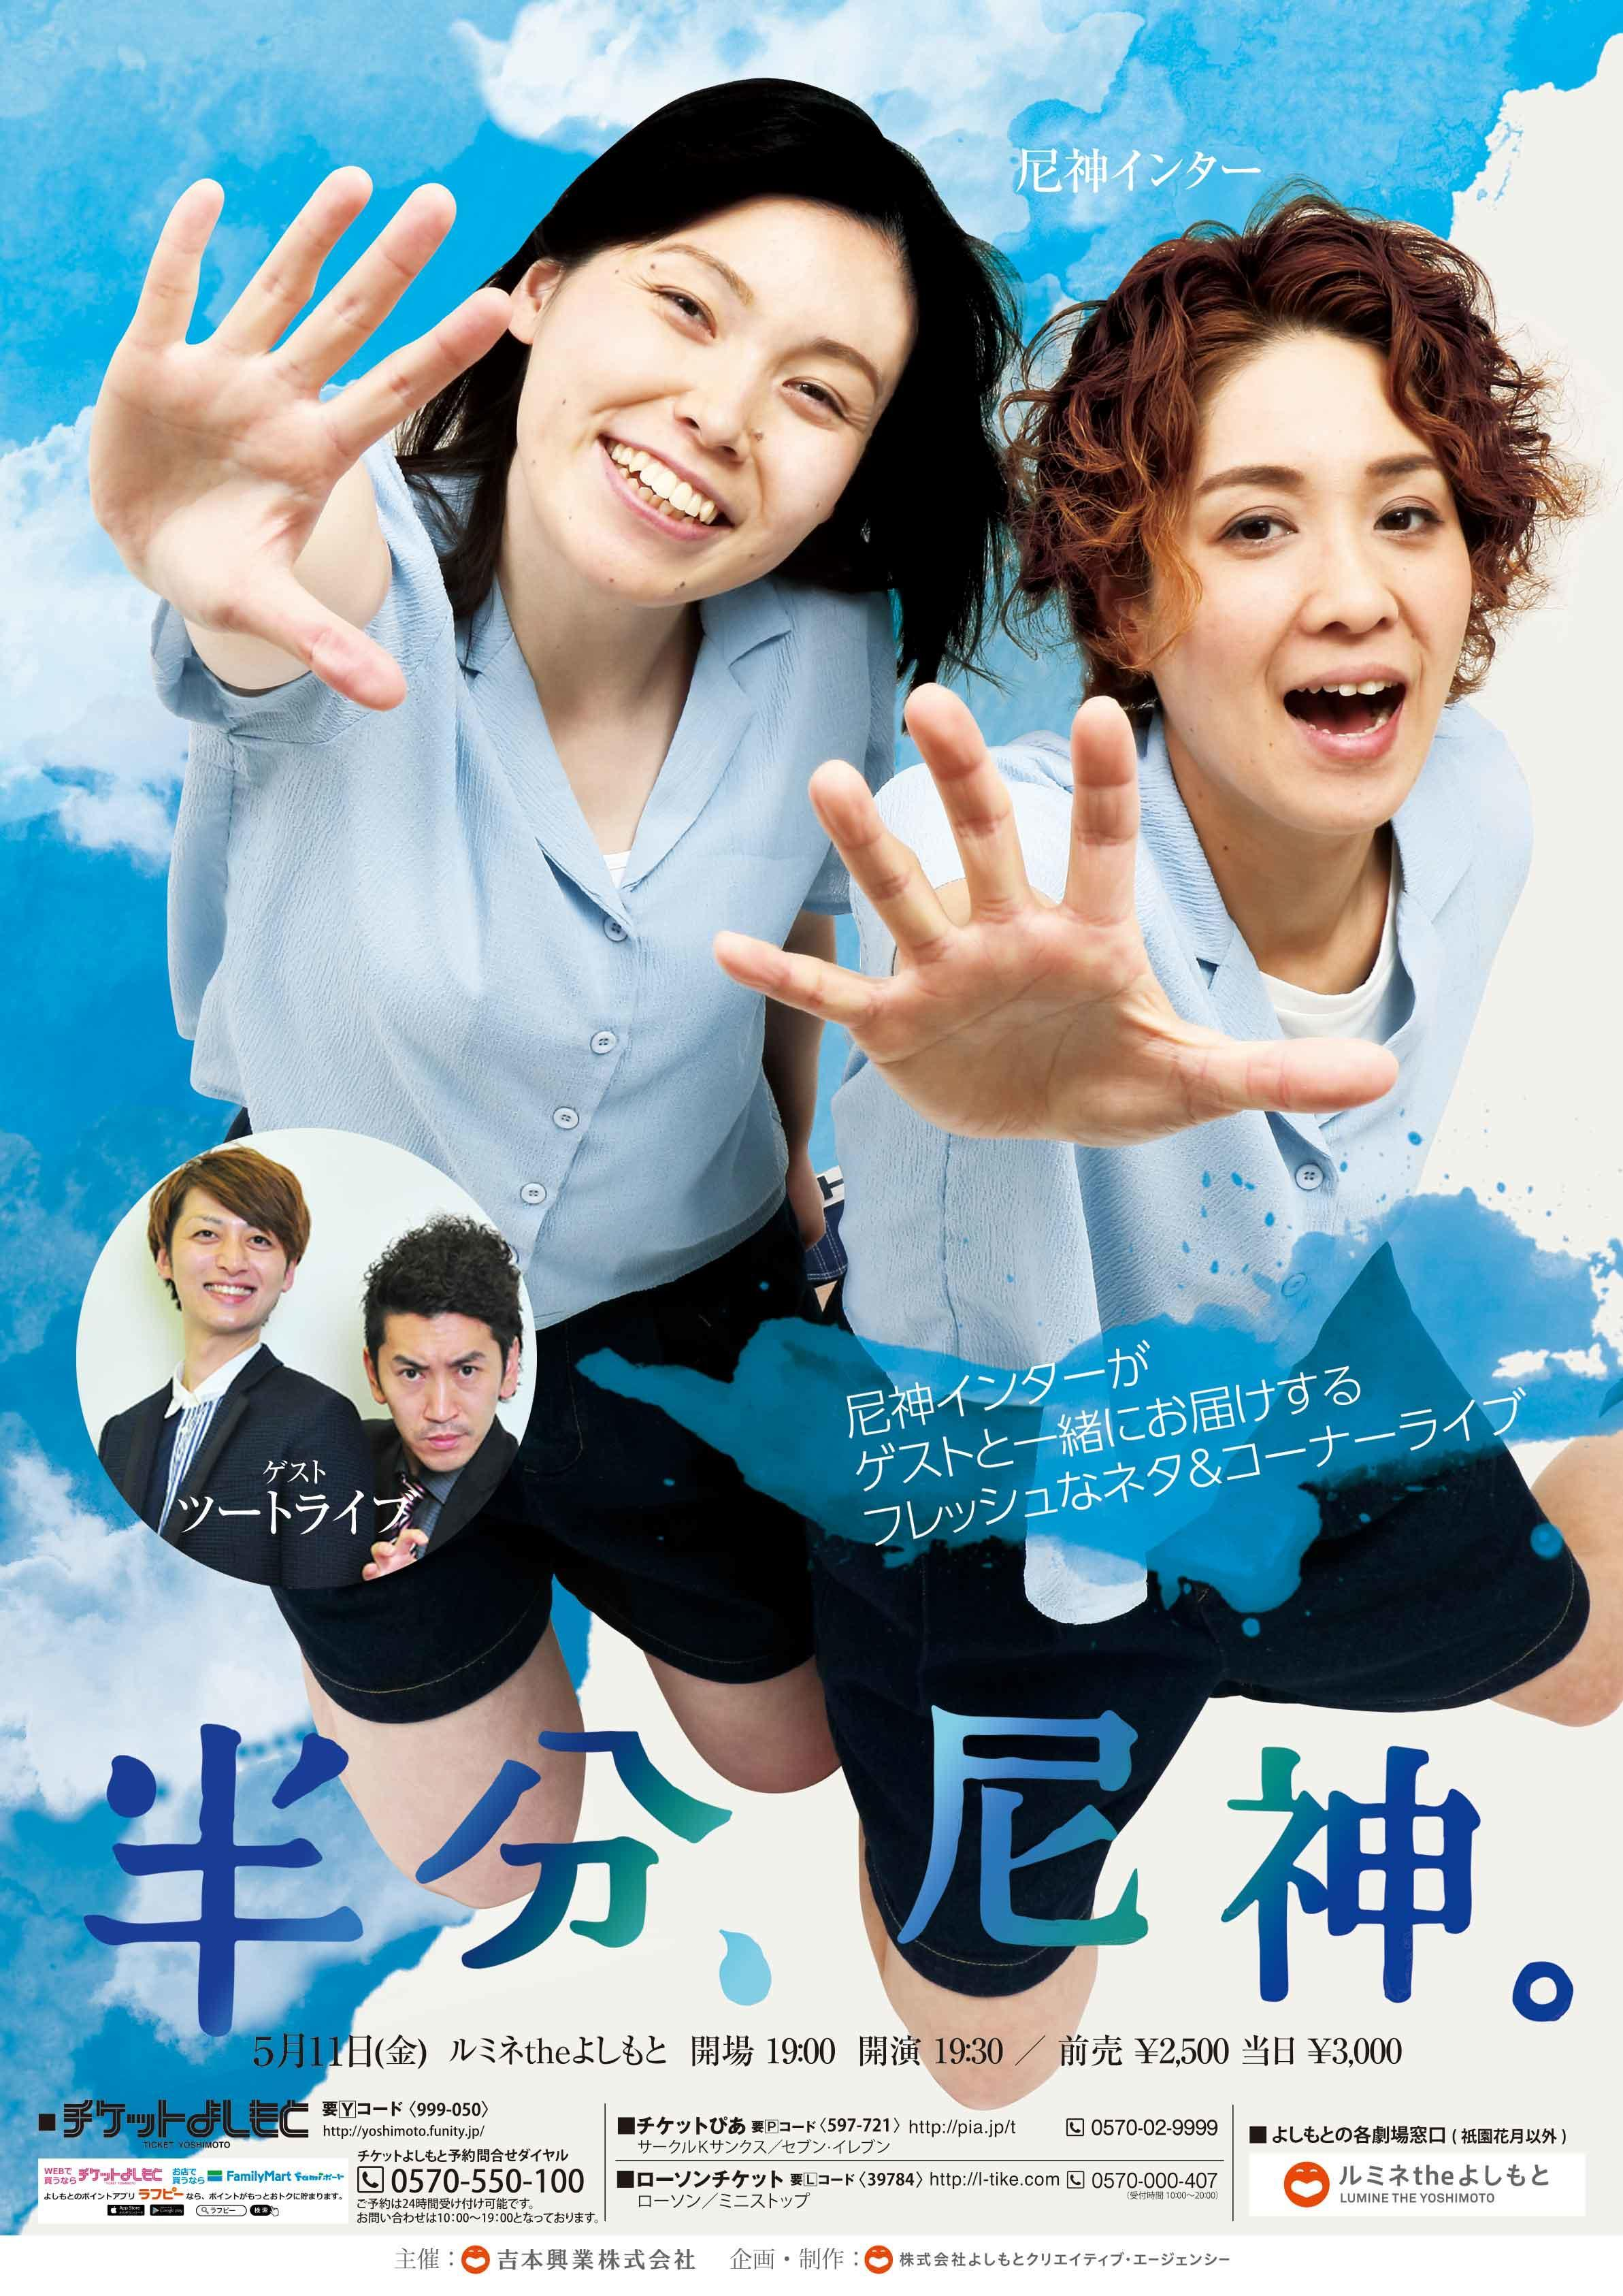 http://news.yoshimoto.co.jp/20180426155640-f9d61759f61d67315bd86713e6cf762611e2908a.jpg